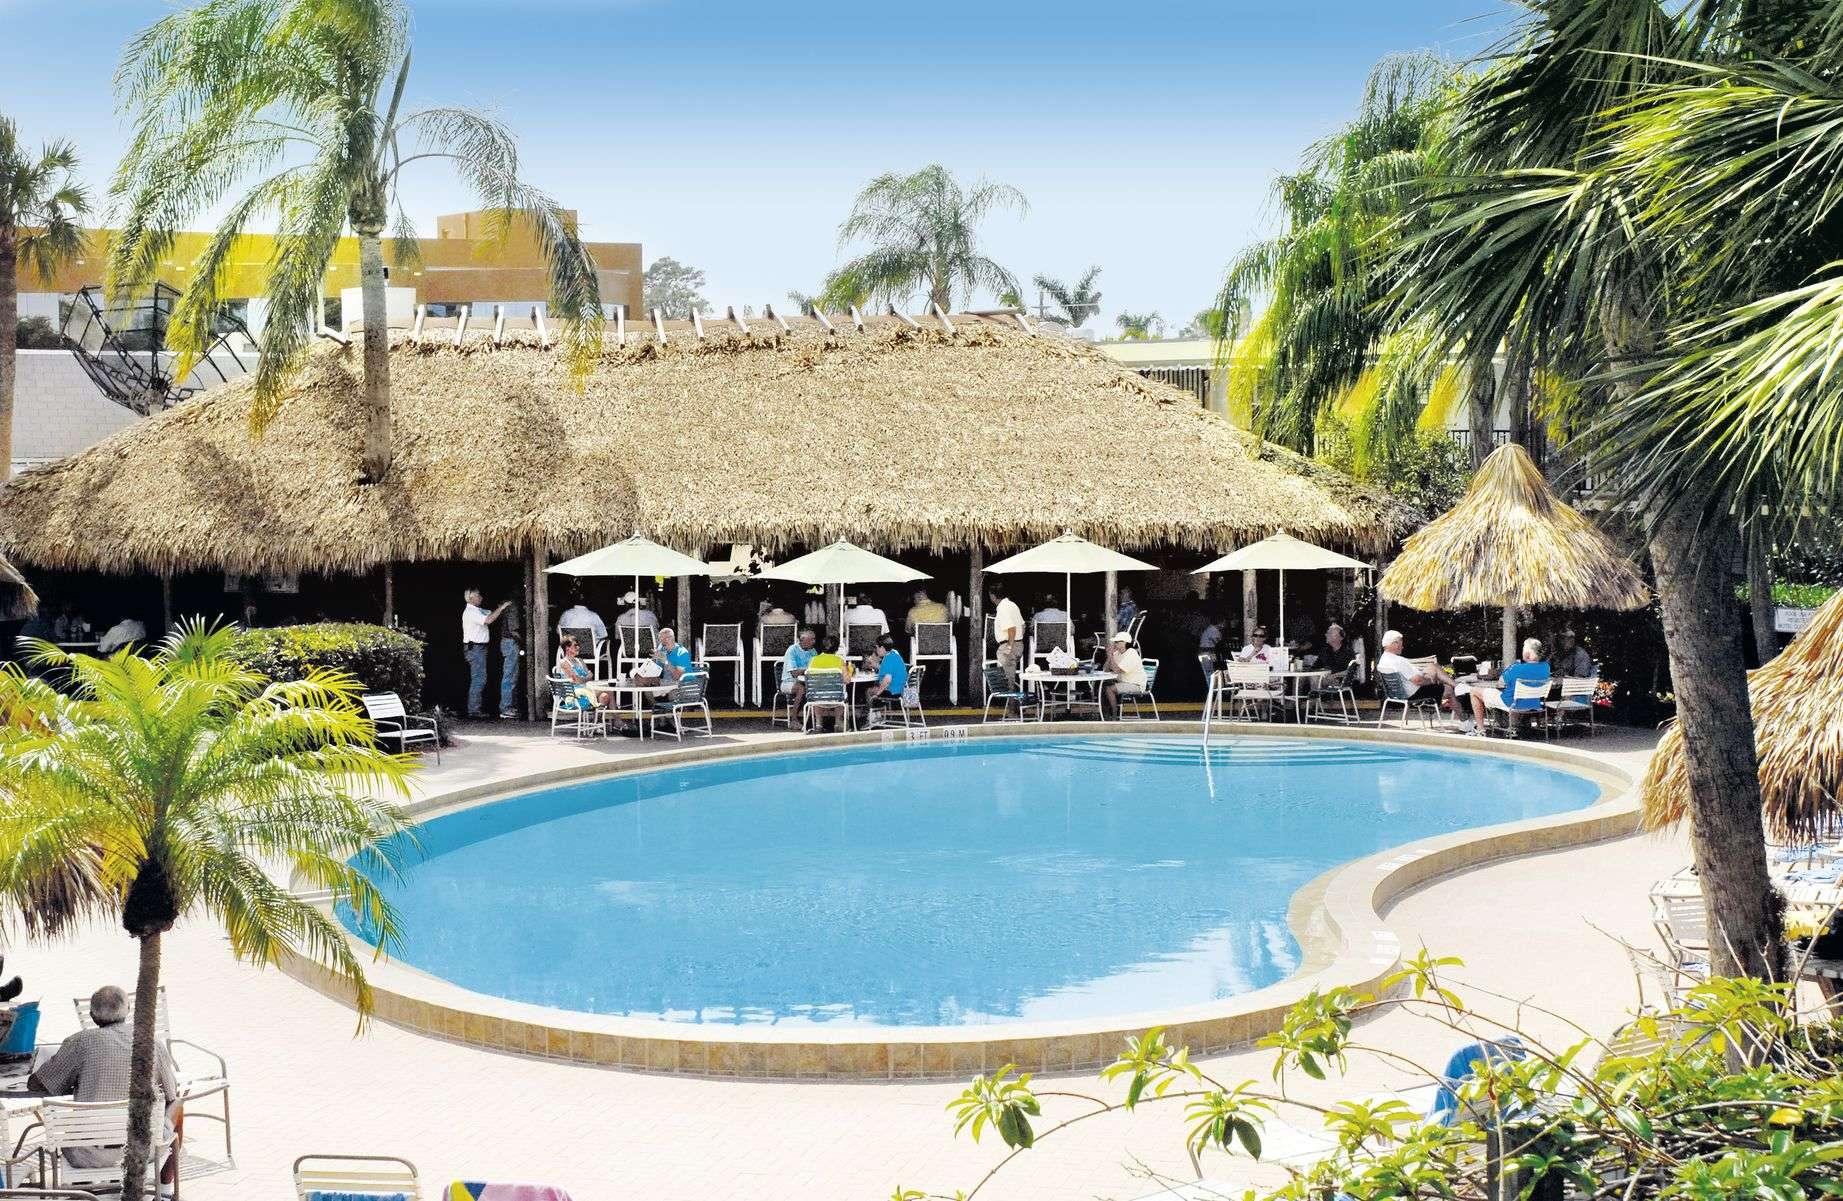 Gulf Coast Inn